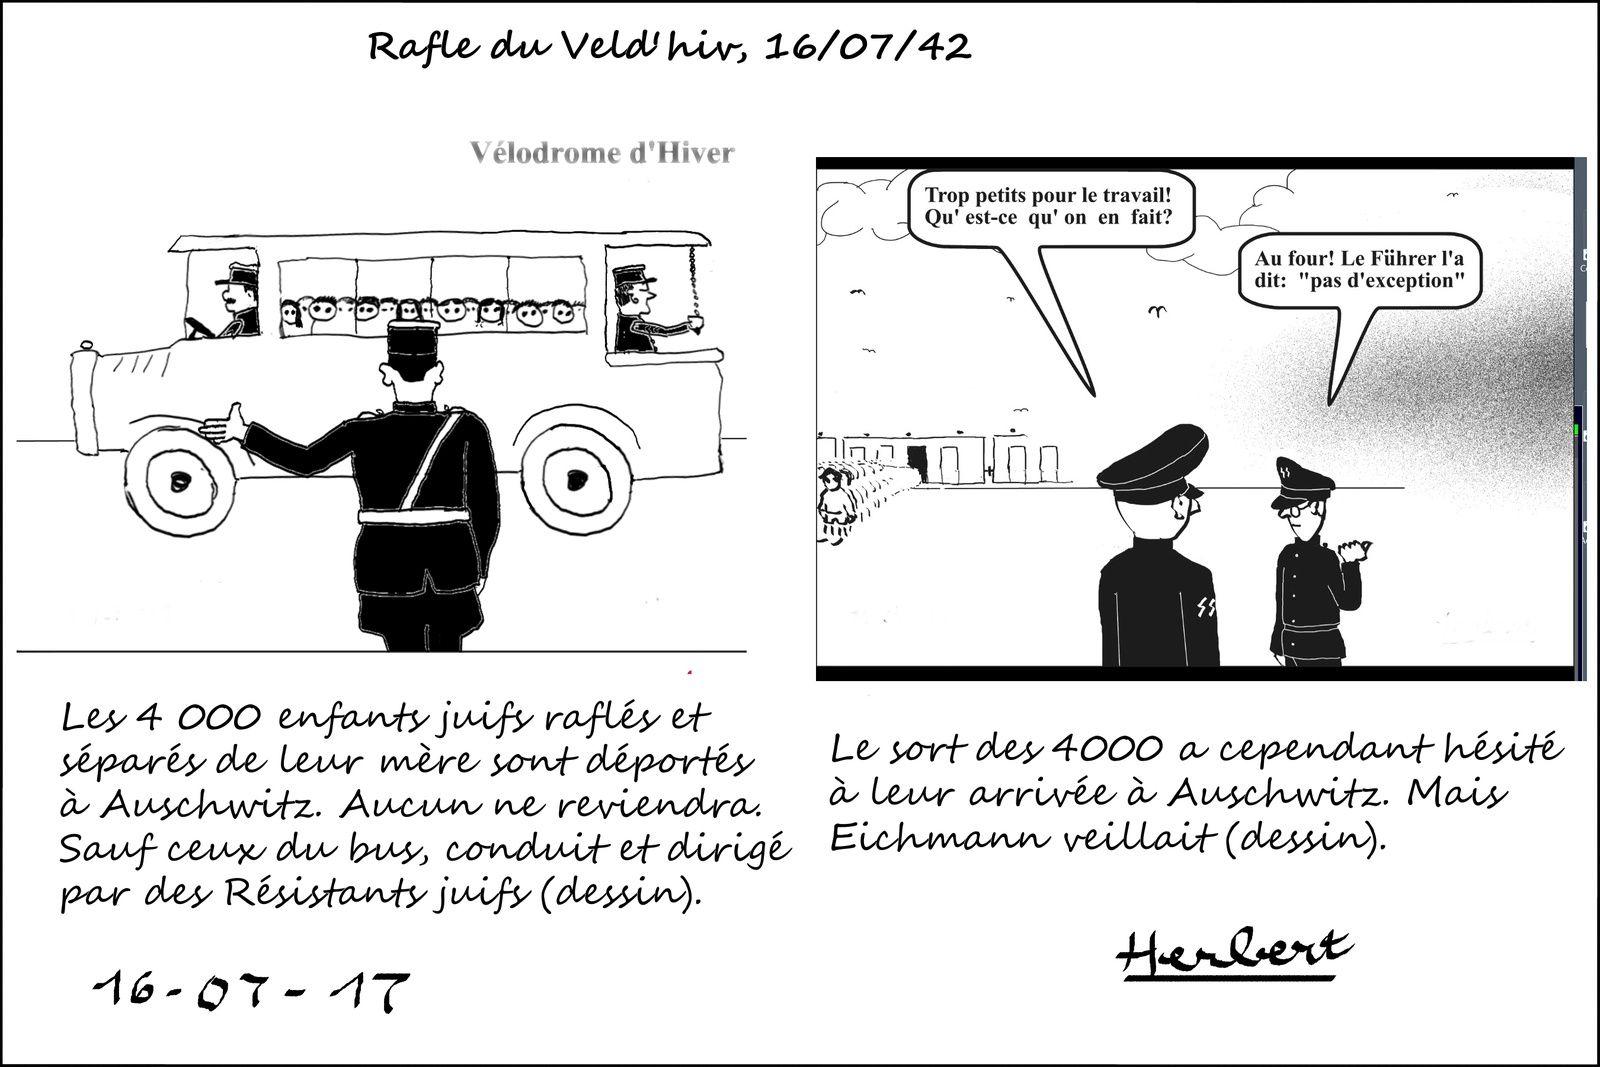 Rafle du Vel d'Hiv, 75 ans après